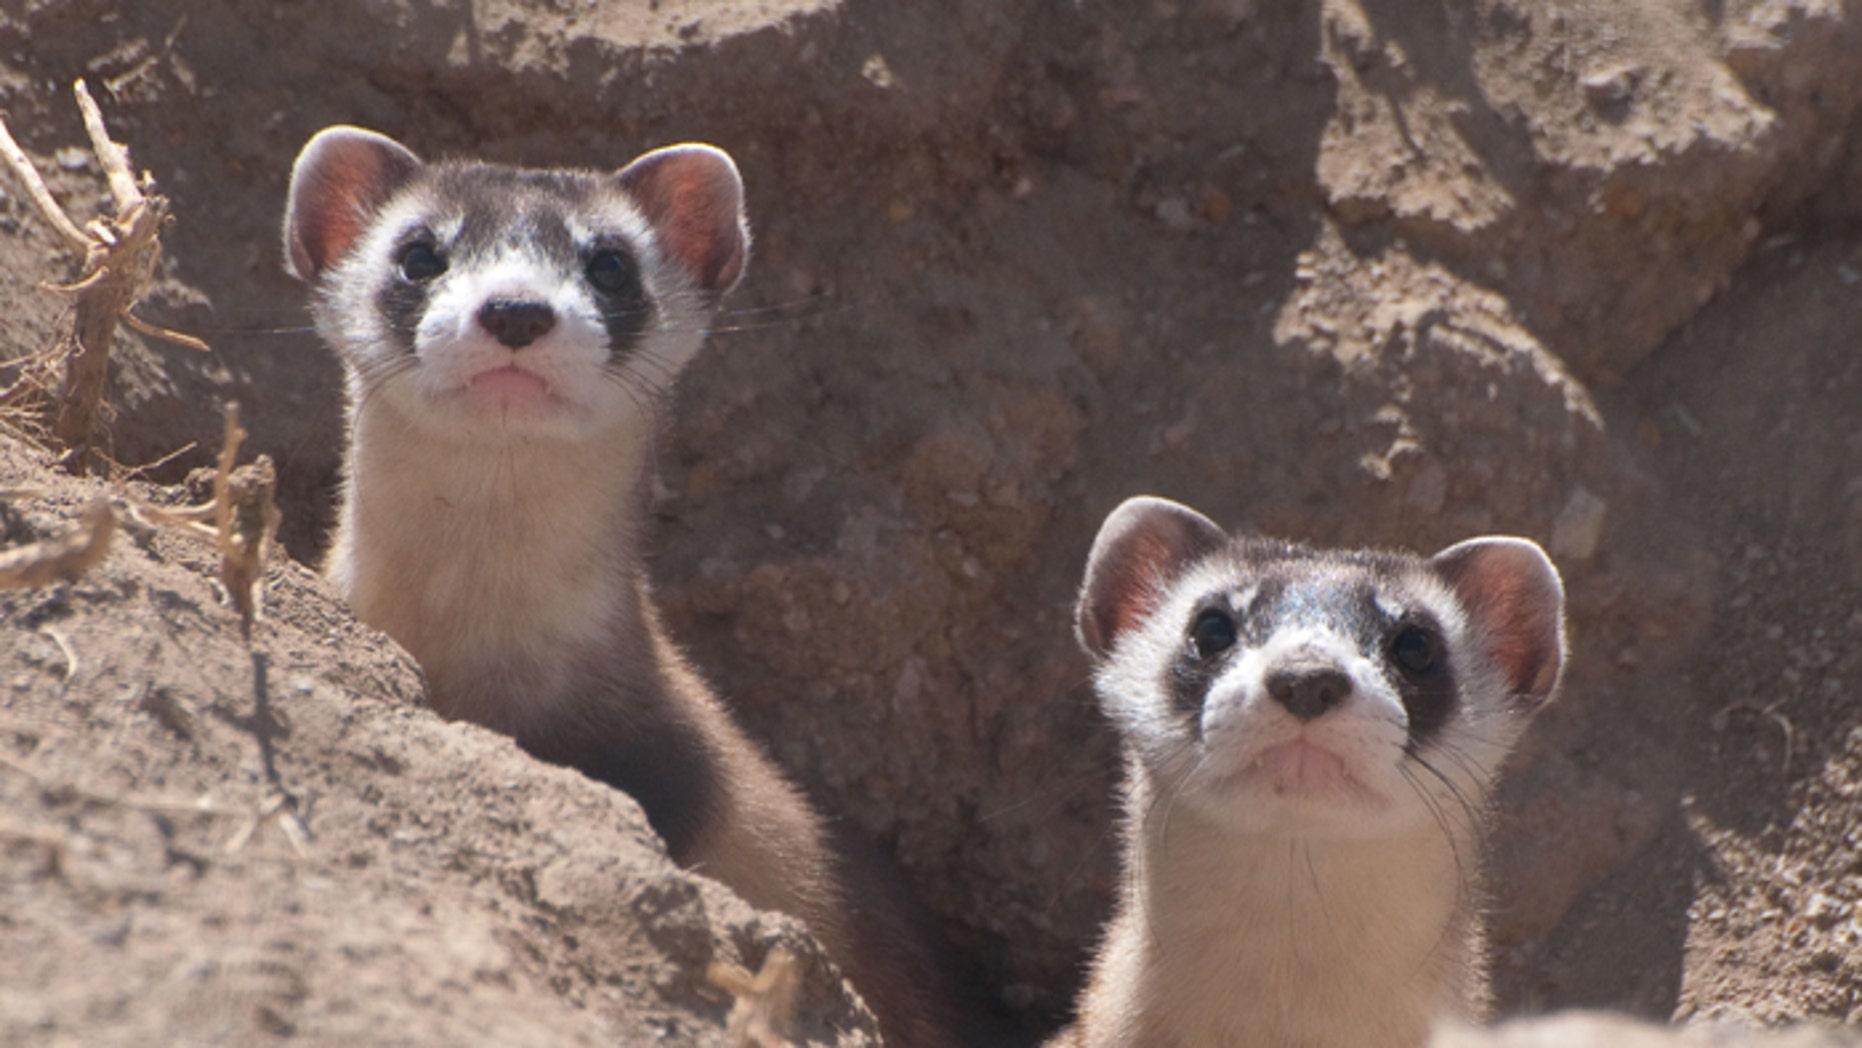 File photo - Two ferret kits peer out of a burrow (Photo Credit: Kimberly Tamkun, USFWS).